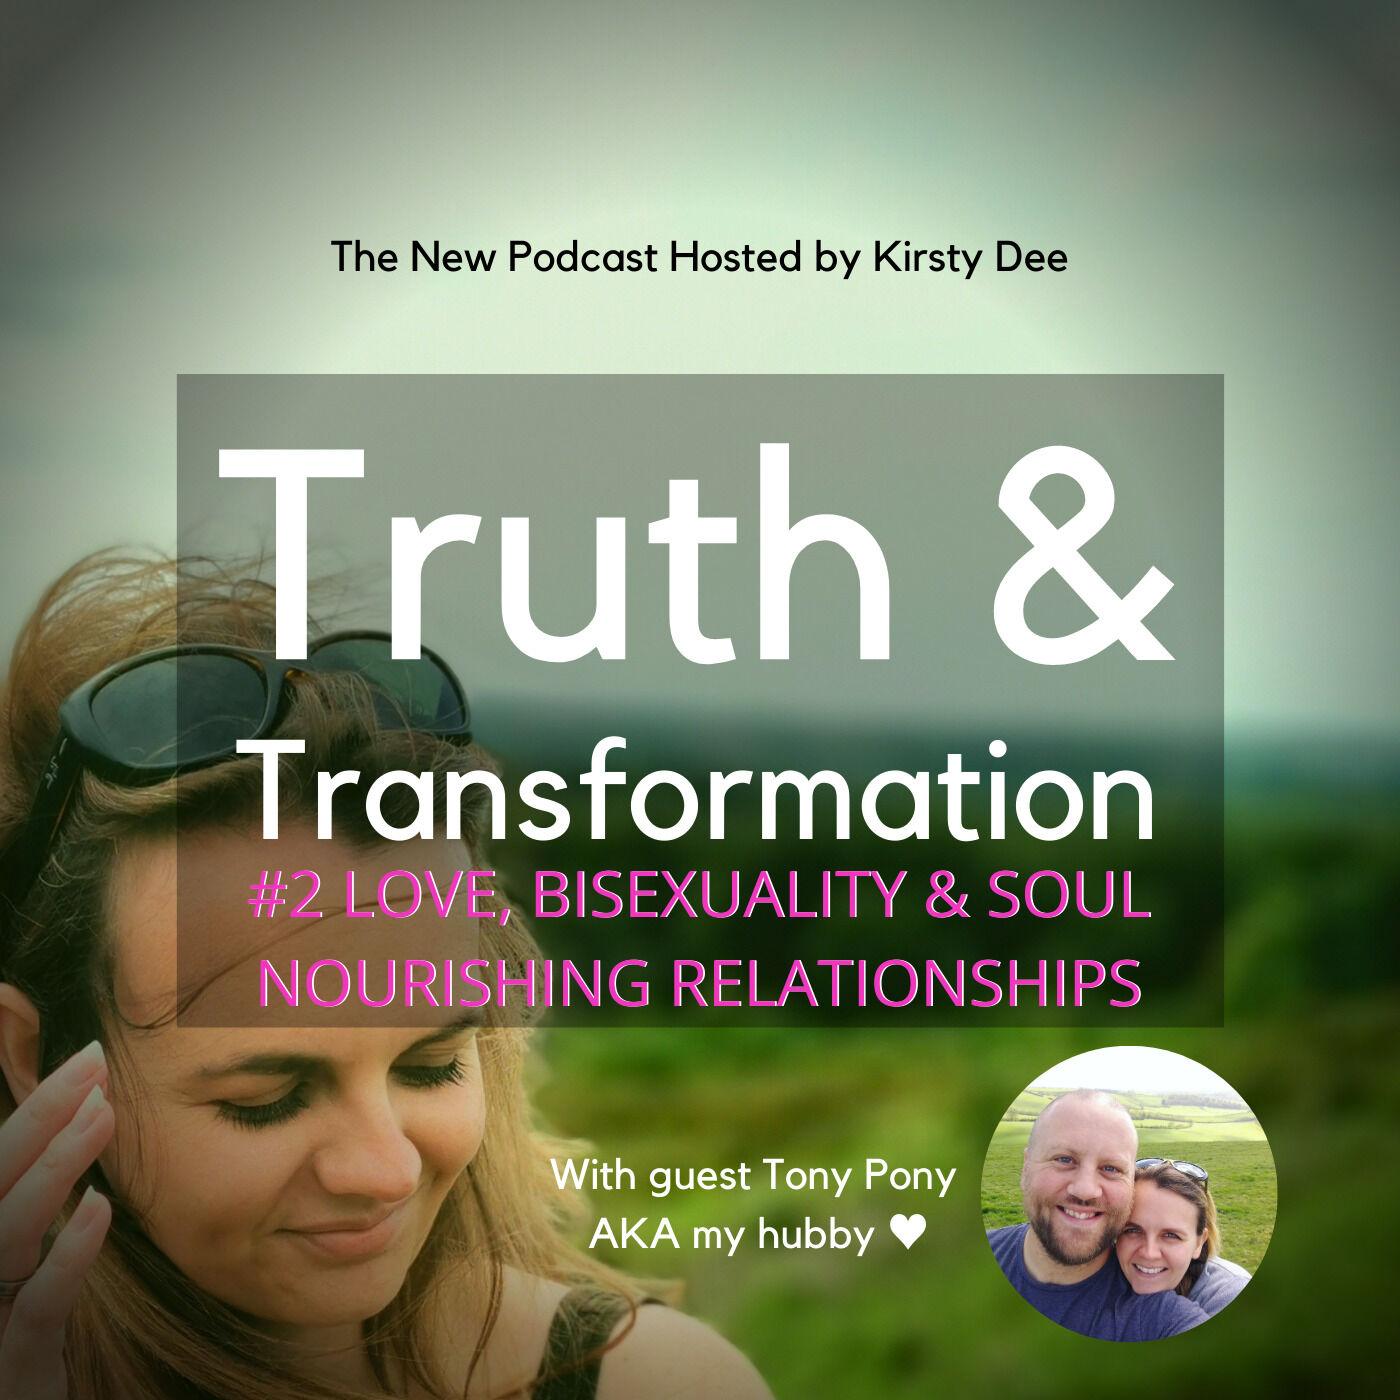 LOVE, BISEXUALITY & SOUL NOURISHING RELATIONSHIPS